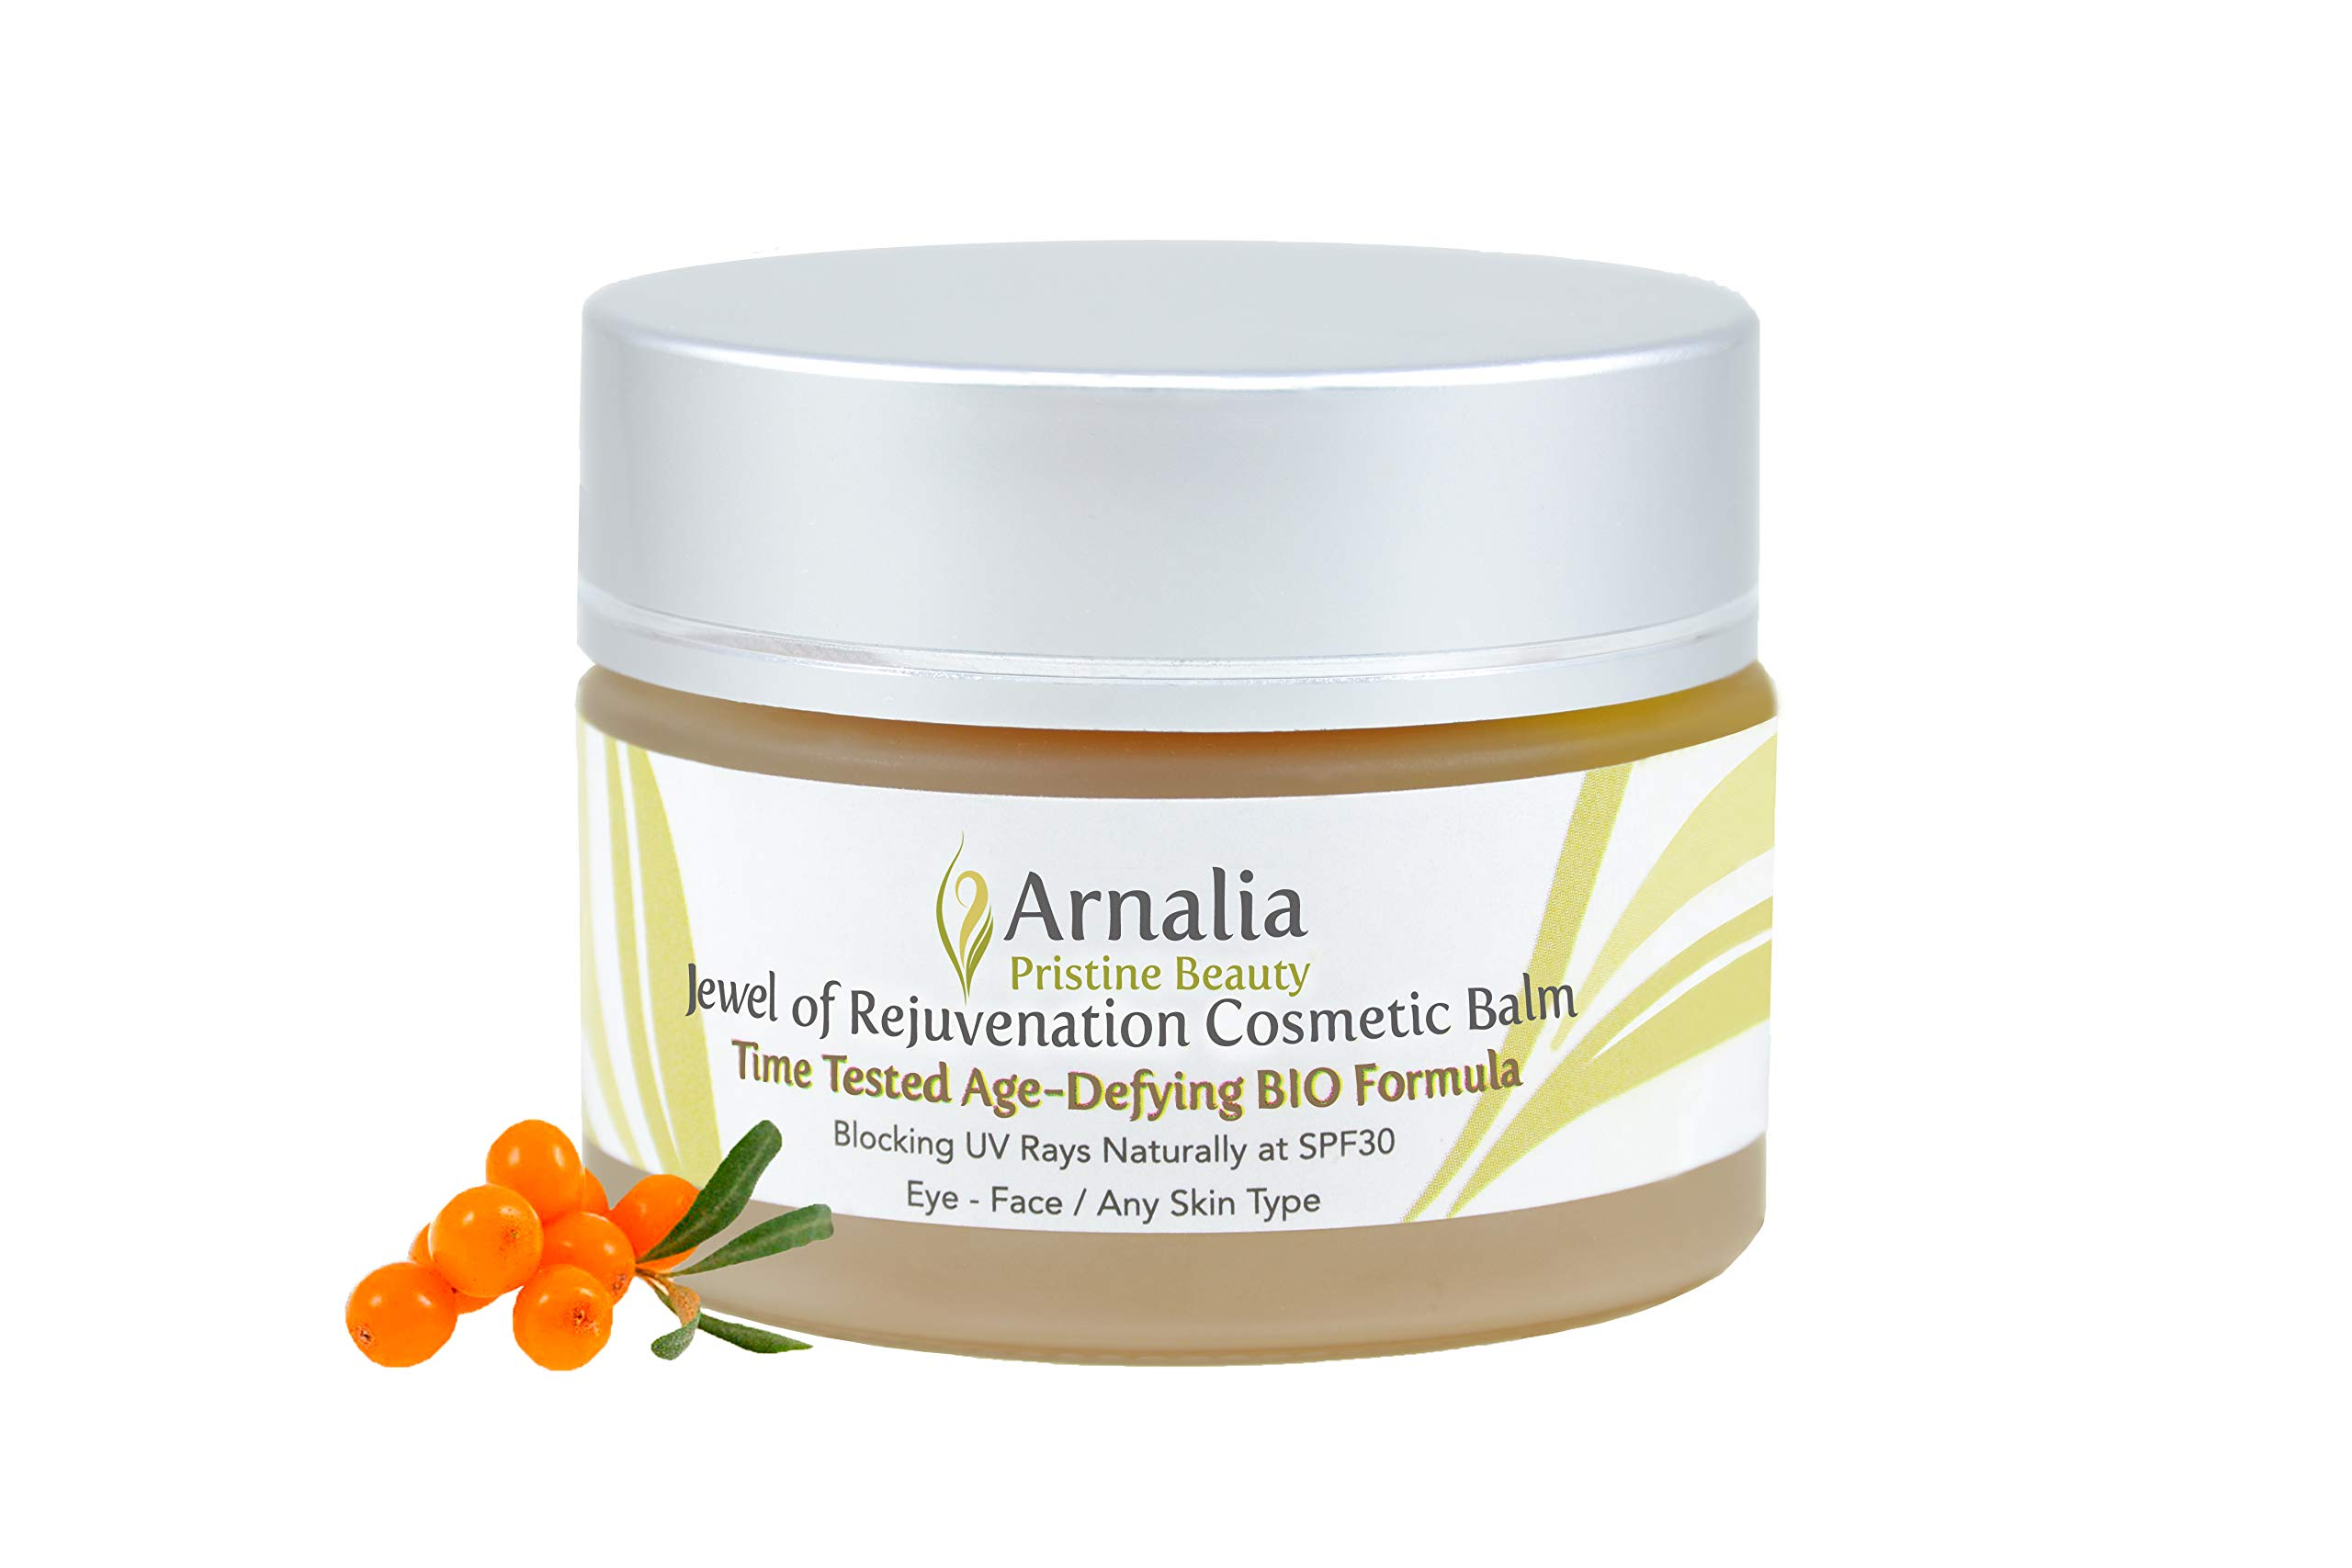 ARNALIA 100% Natural & Organic Wild Herbs, Eye&Face Cosmetic Skin Care Cream, Emollient, Anti Wrinkle, Anti Aging, Age Spot, Firming, Hydrating Balm, Collagen, Vitamin A,C,E,F Moisturizer, SPF 1.1oz by Arnalia